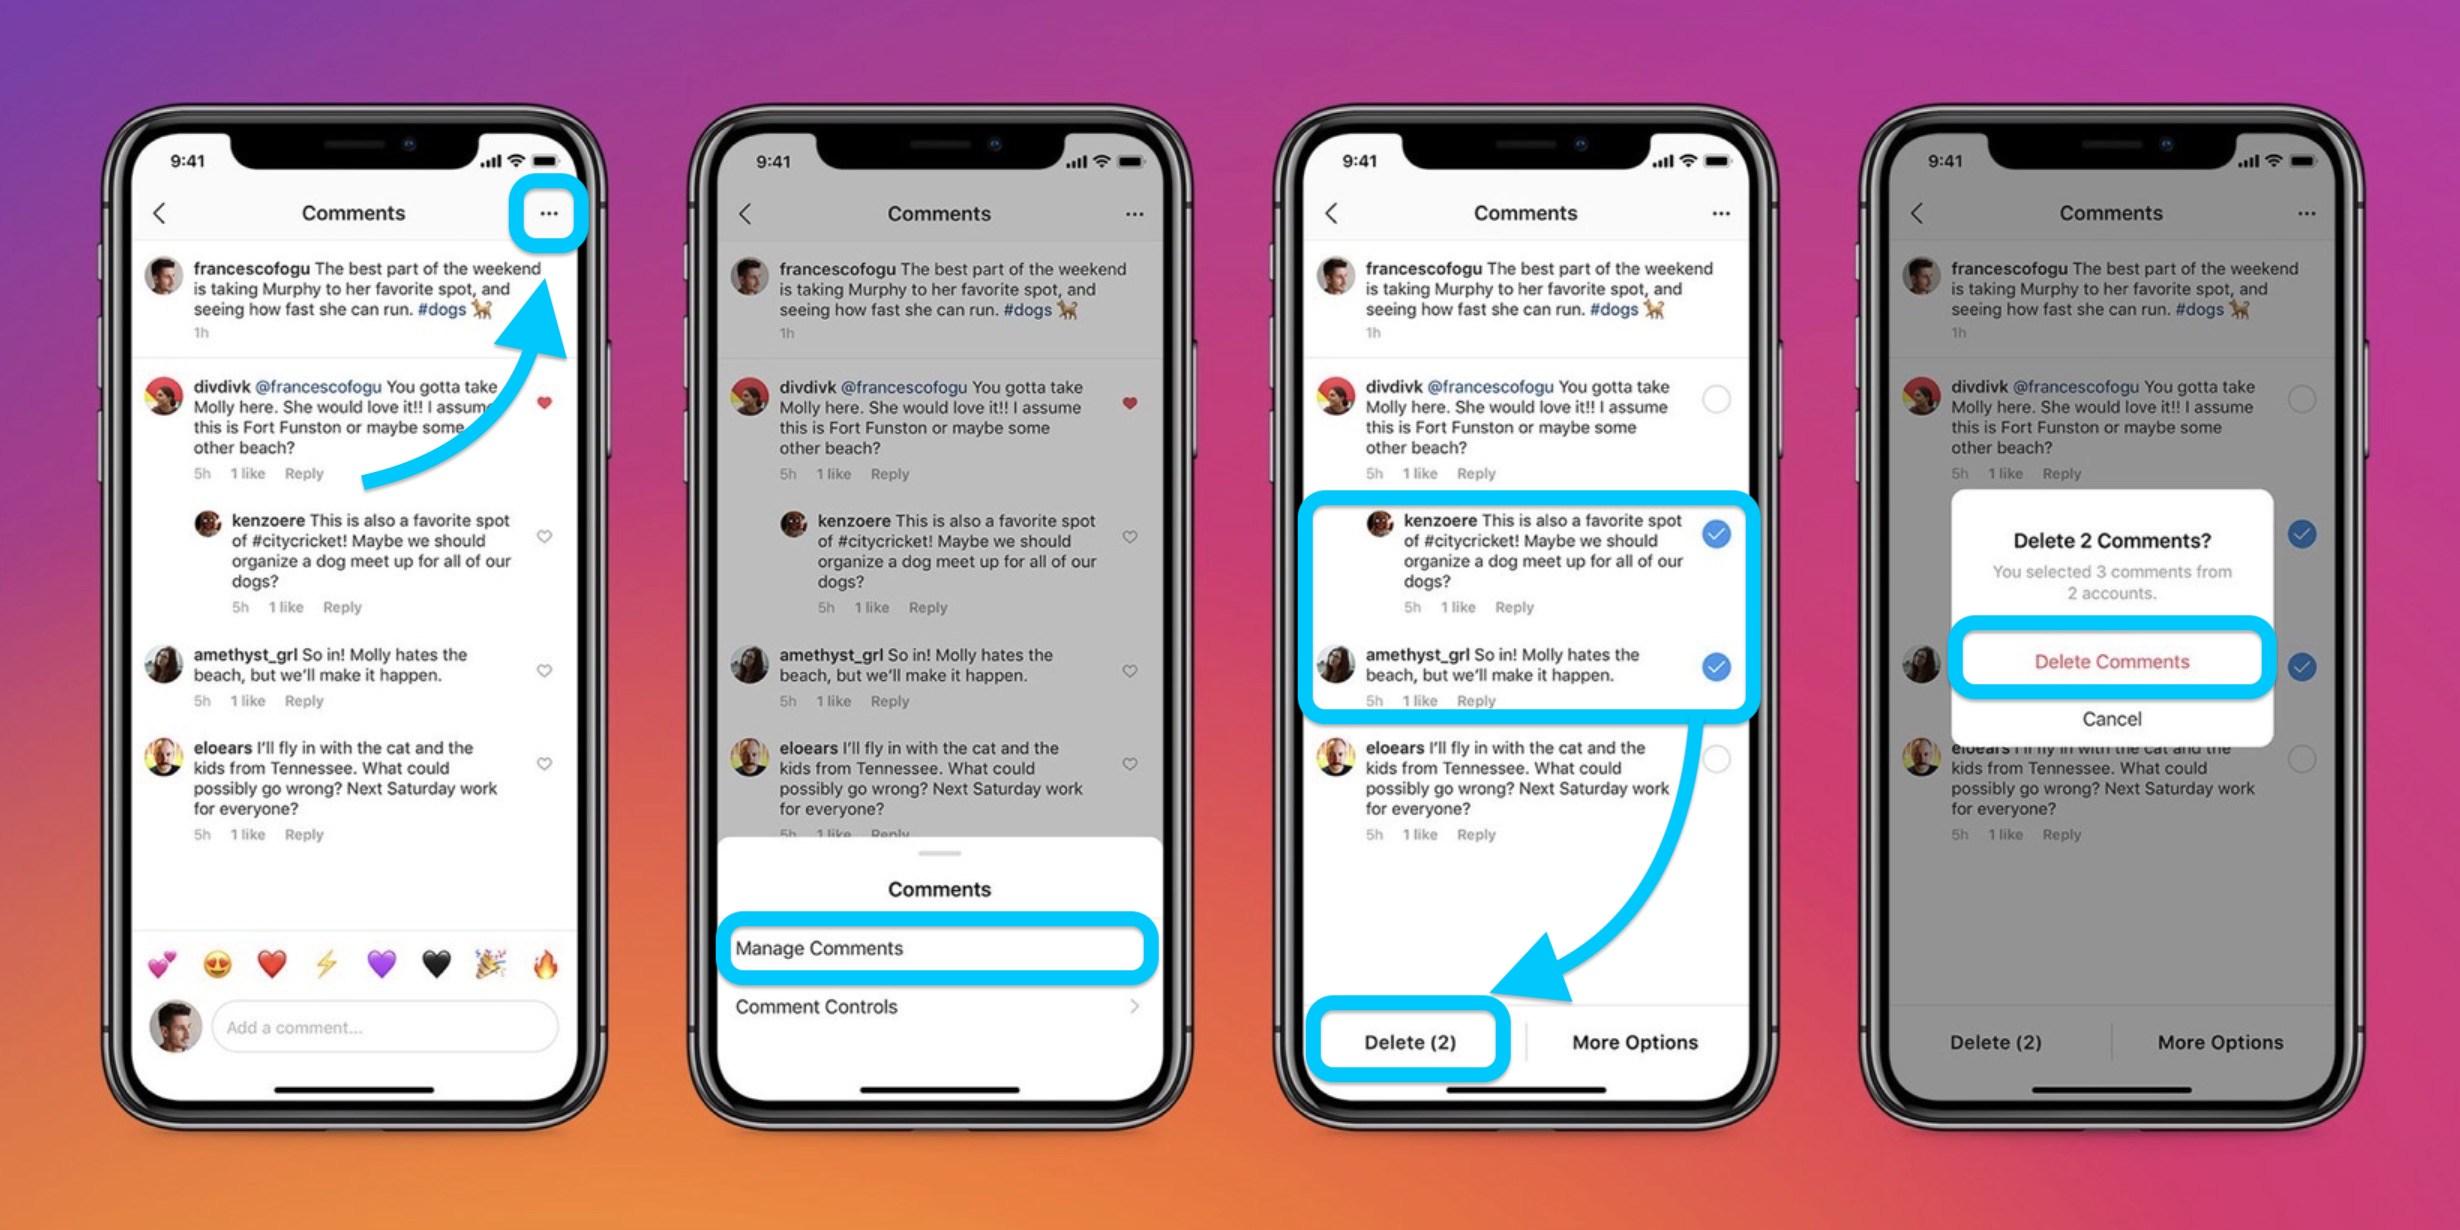 How to bulk delete comments Instagram iPhone iOS